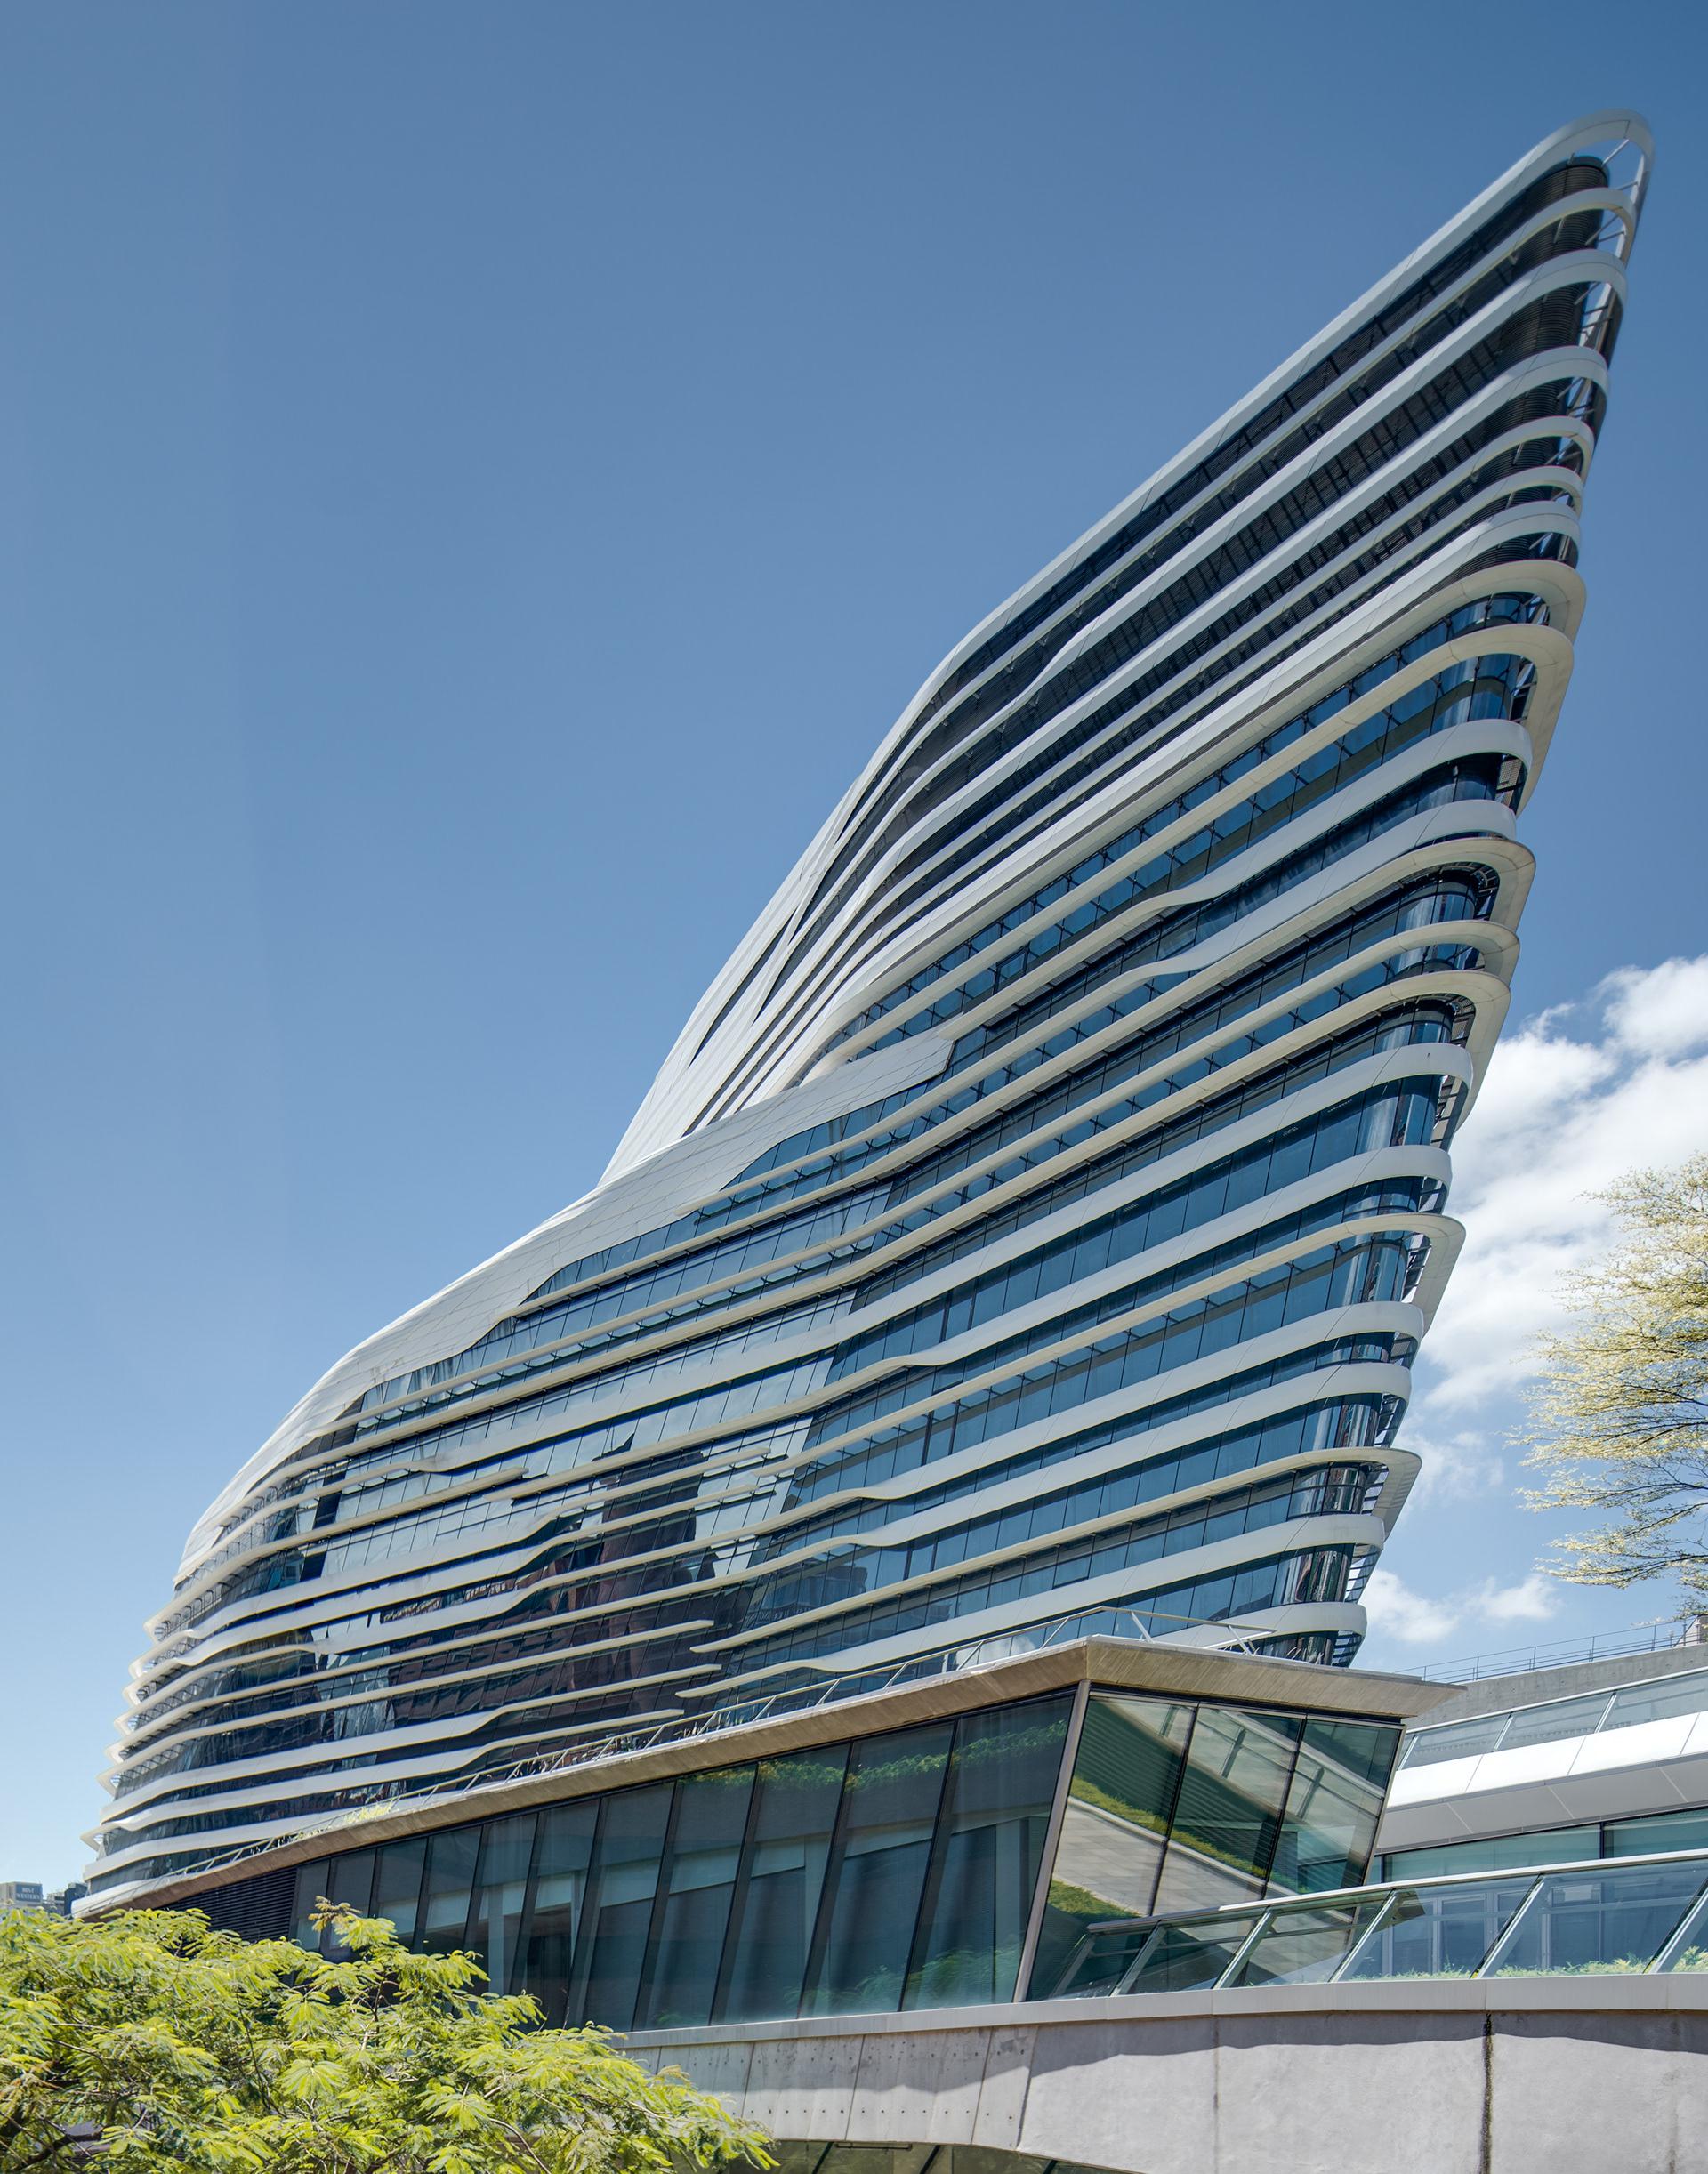 Zaha Hadid Architect's Amazingness Innovation Tower - Architecture Photography